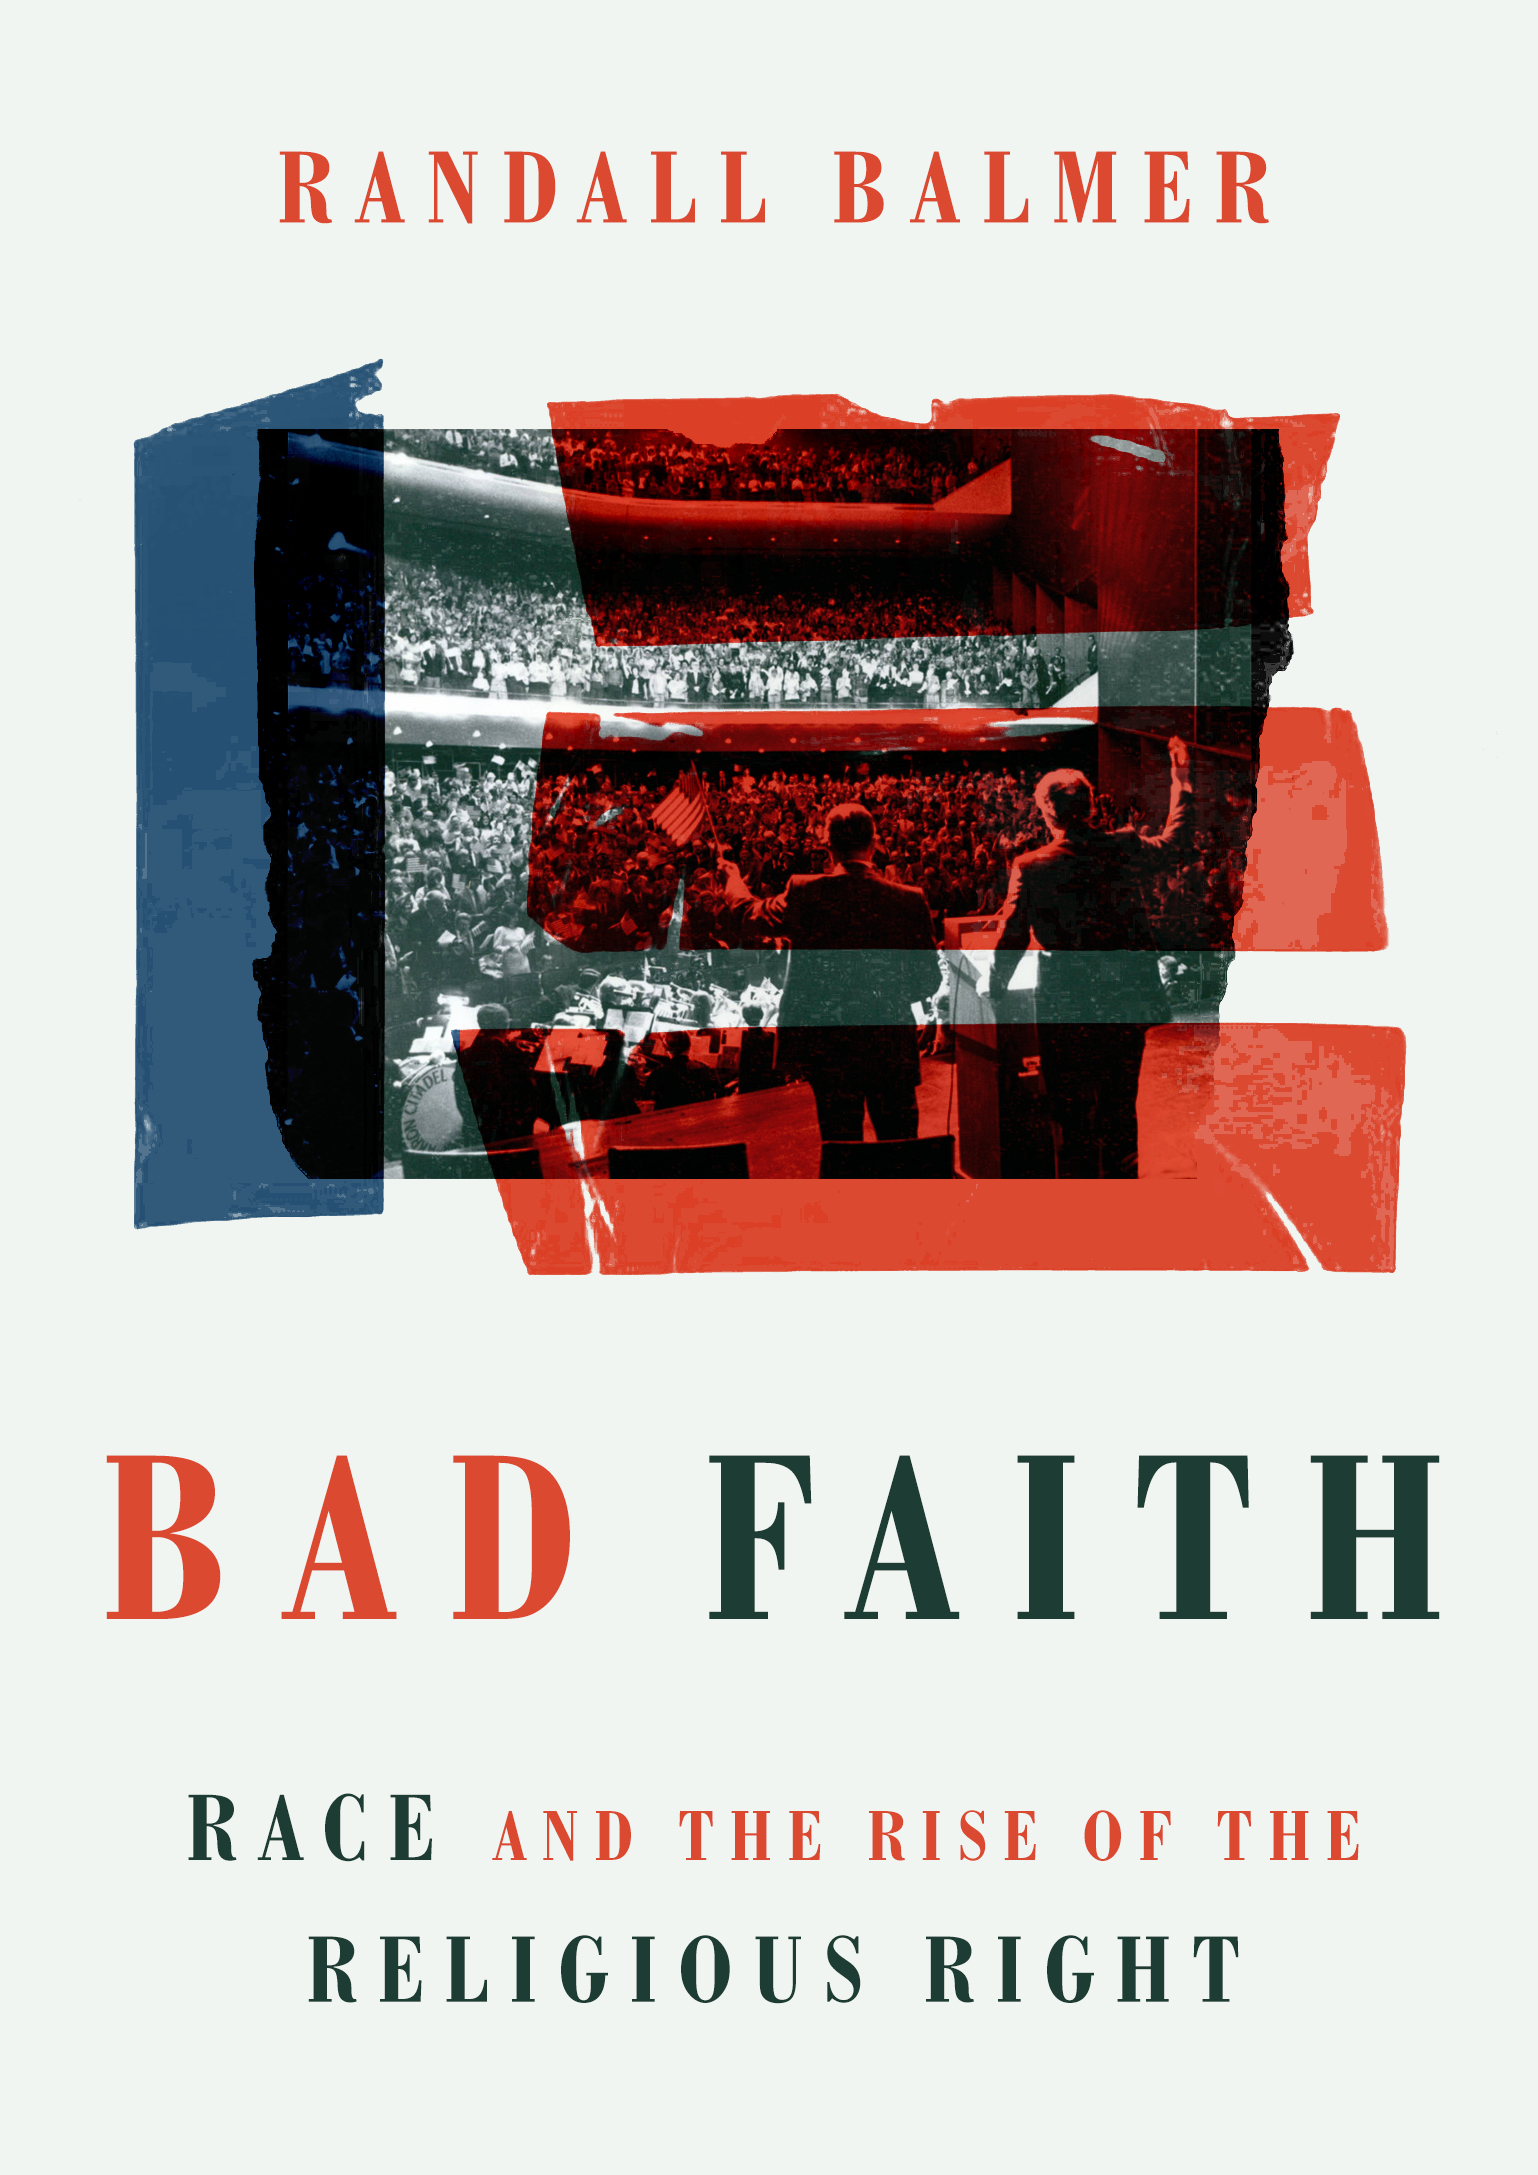 Bad Faith - Randall Balmer : Eerdmans